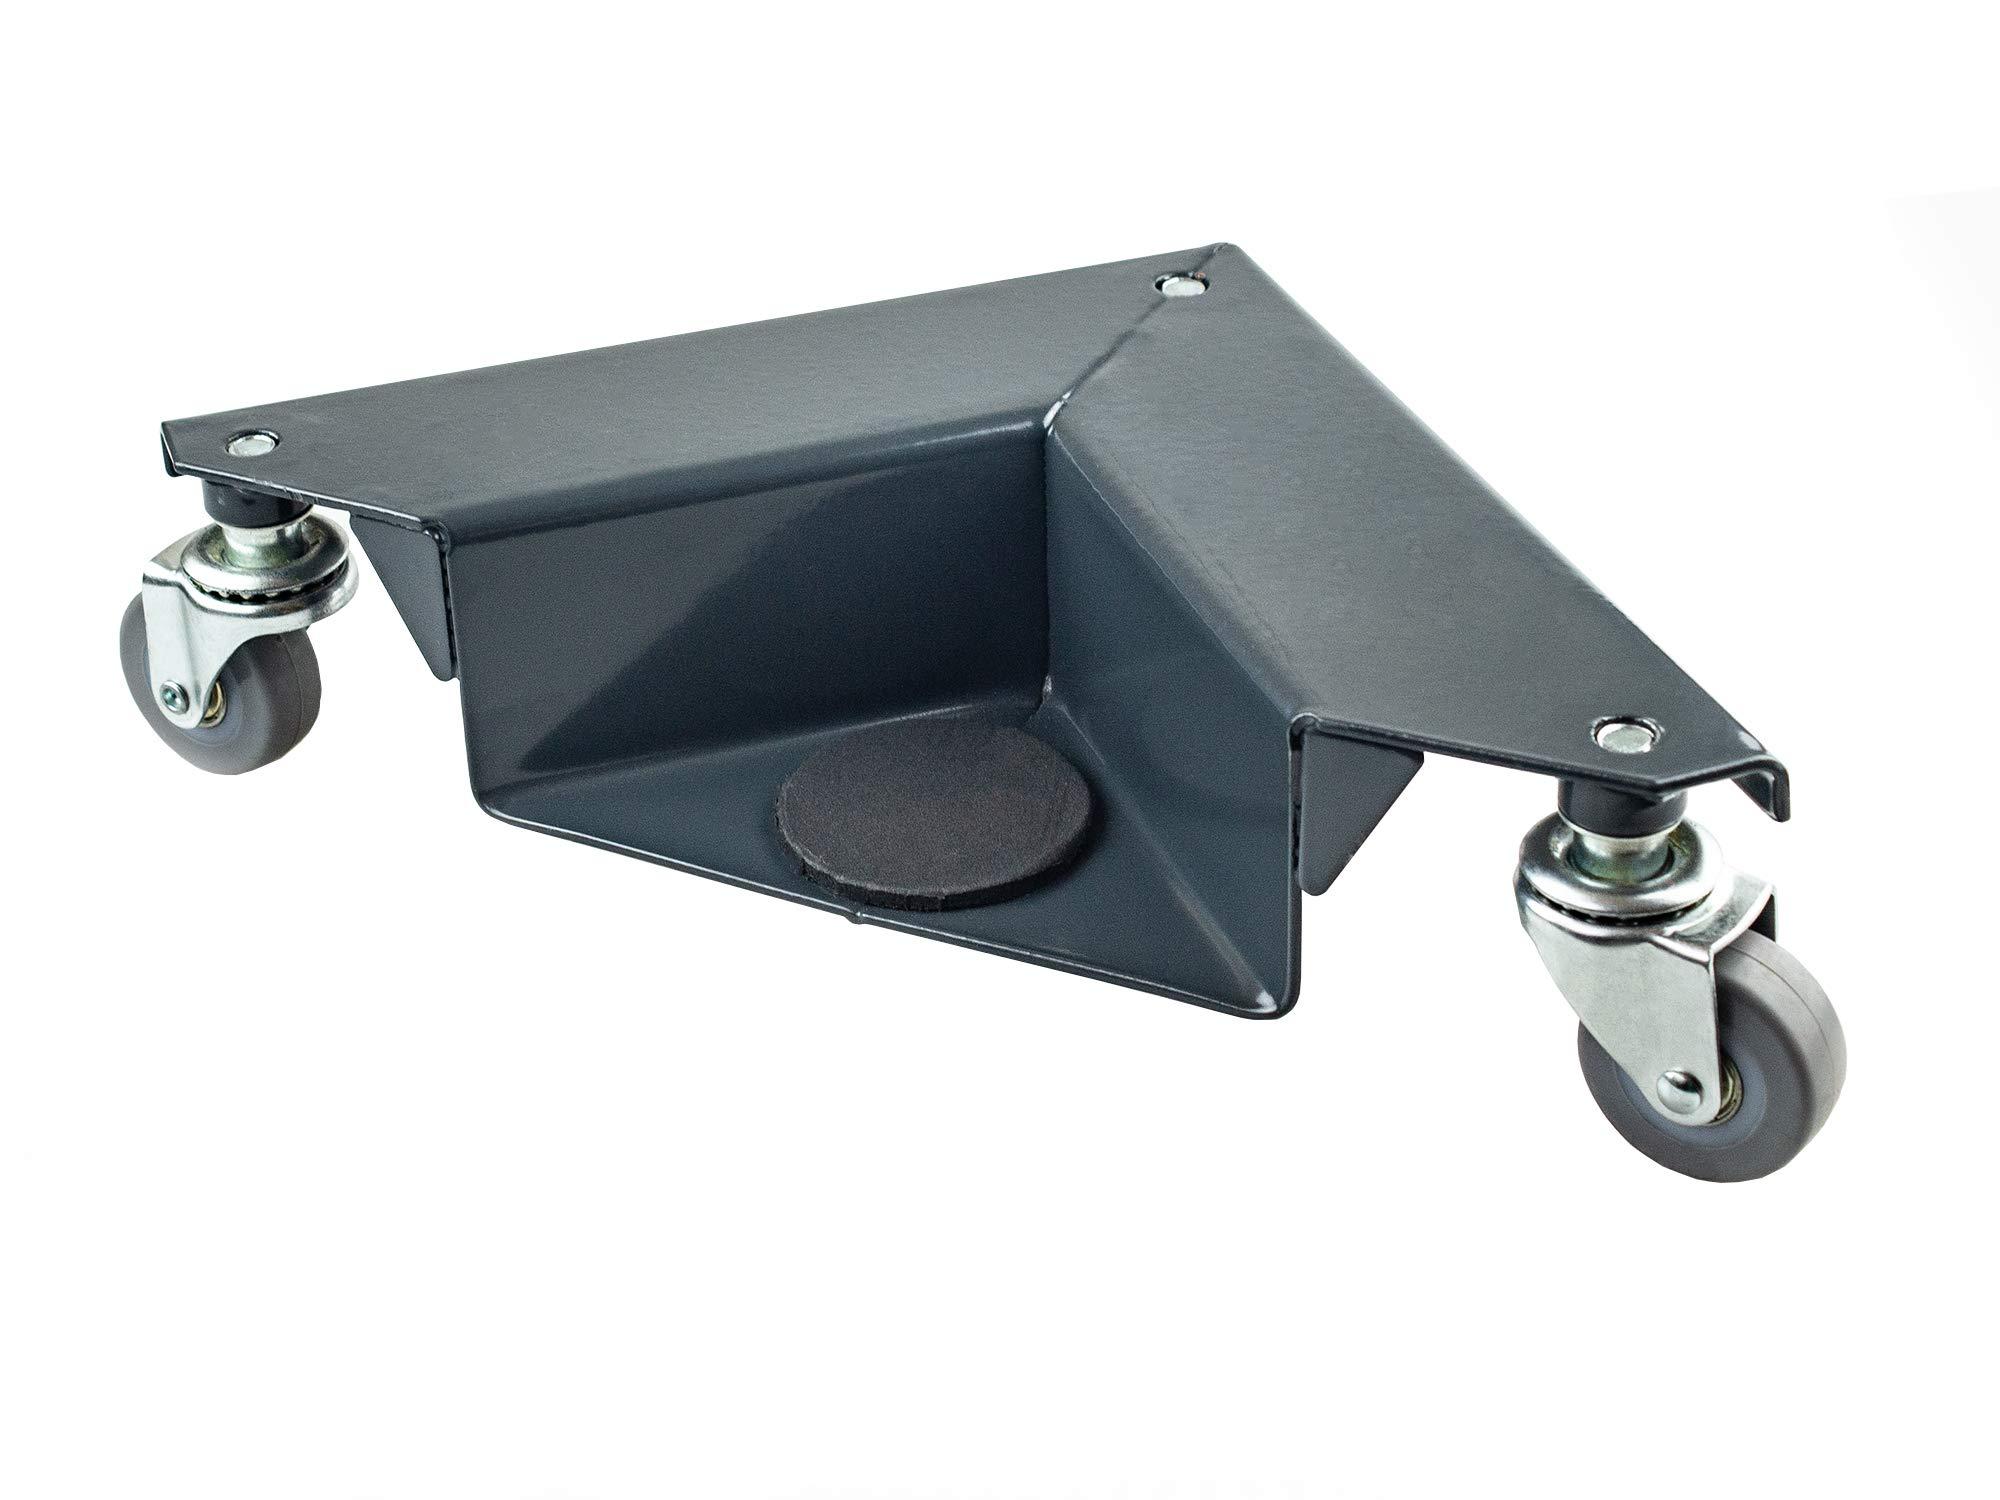 Pake Handling Tools - Furniture Dolly/Corner Mover Dolly 1320 lb. Load Capacity (Set of 4)